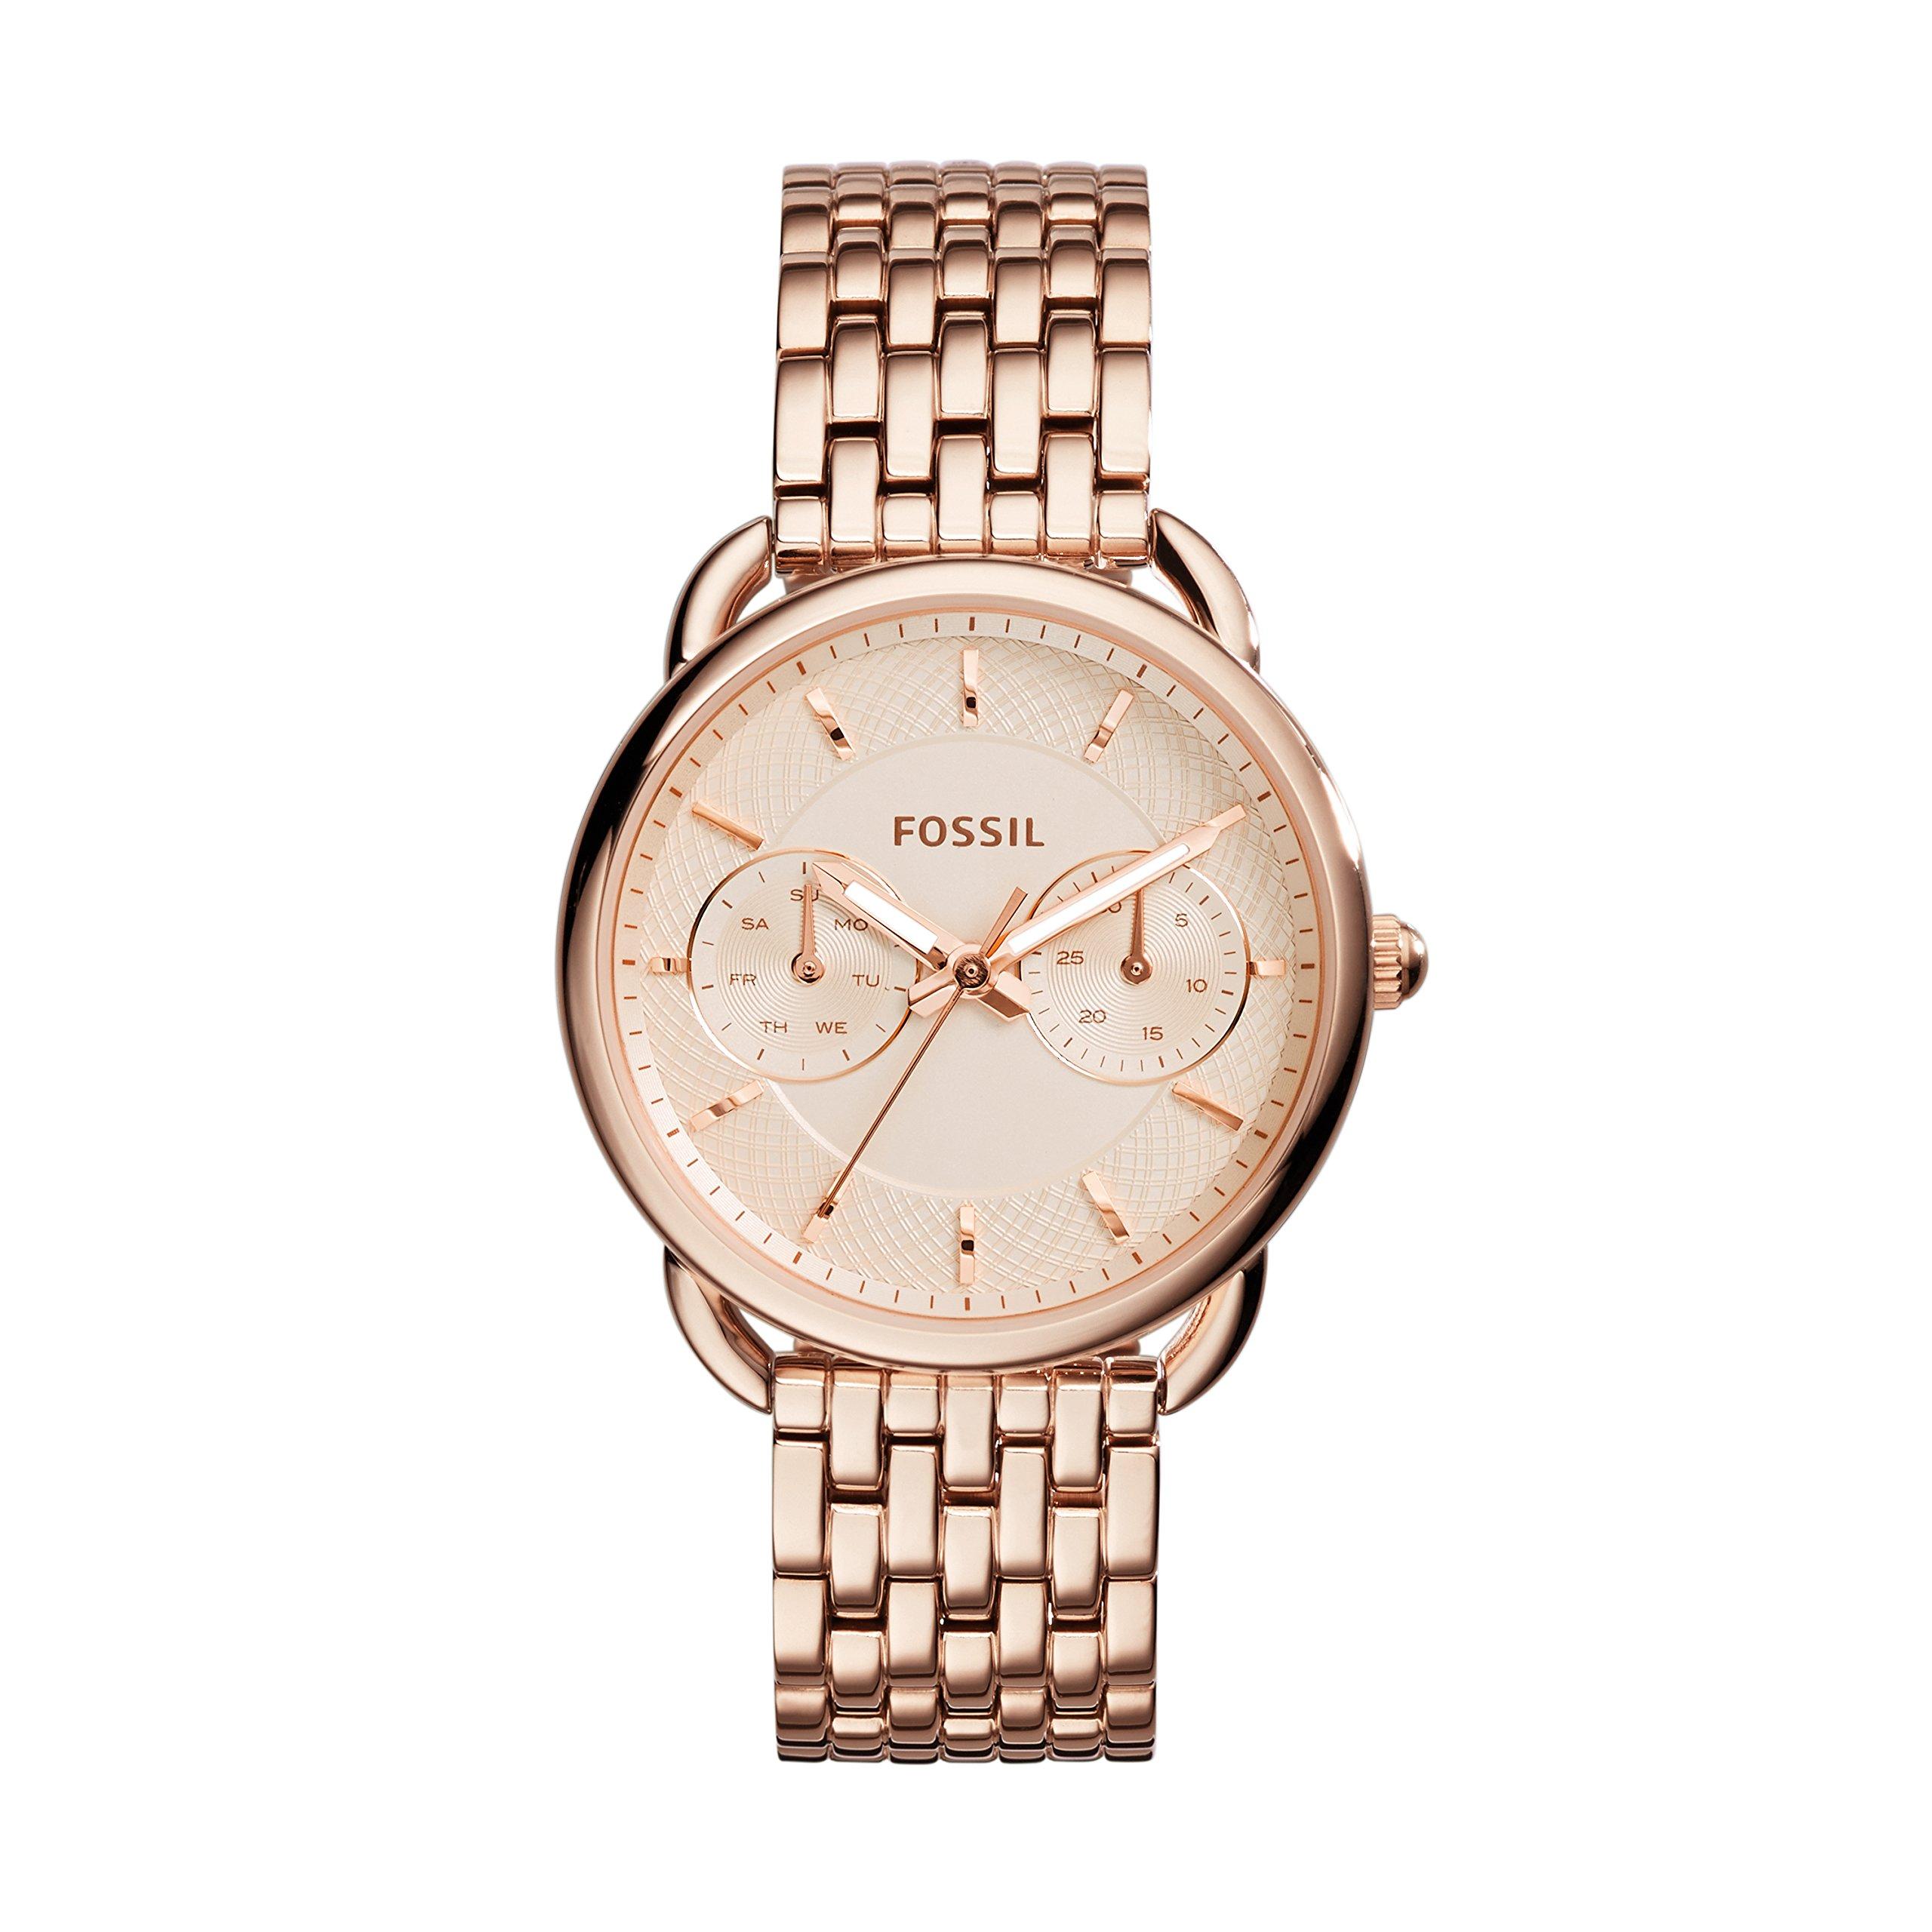 Fossil Women's Tailor Quartz Stainless Steel Dress Watch, Color: Rose Gold-Tone (Model: ES3713)